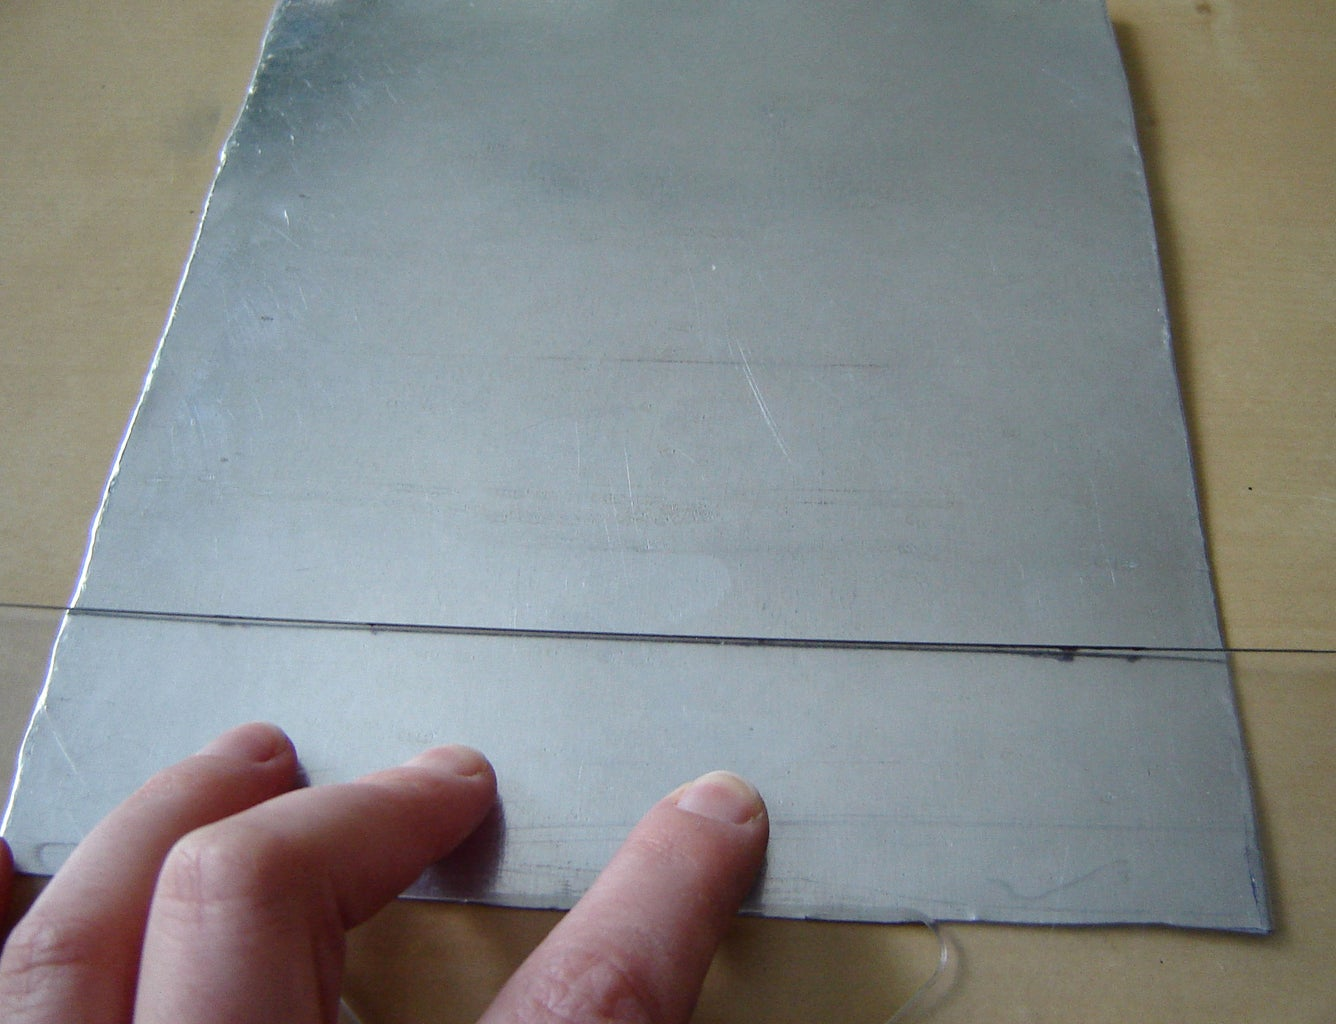 Preparing the Sheet Metal